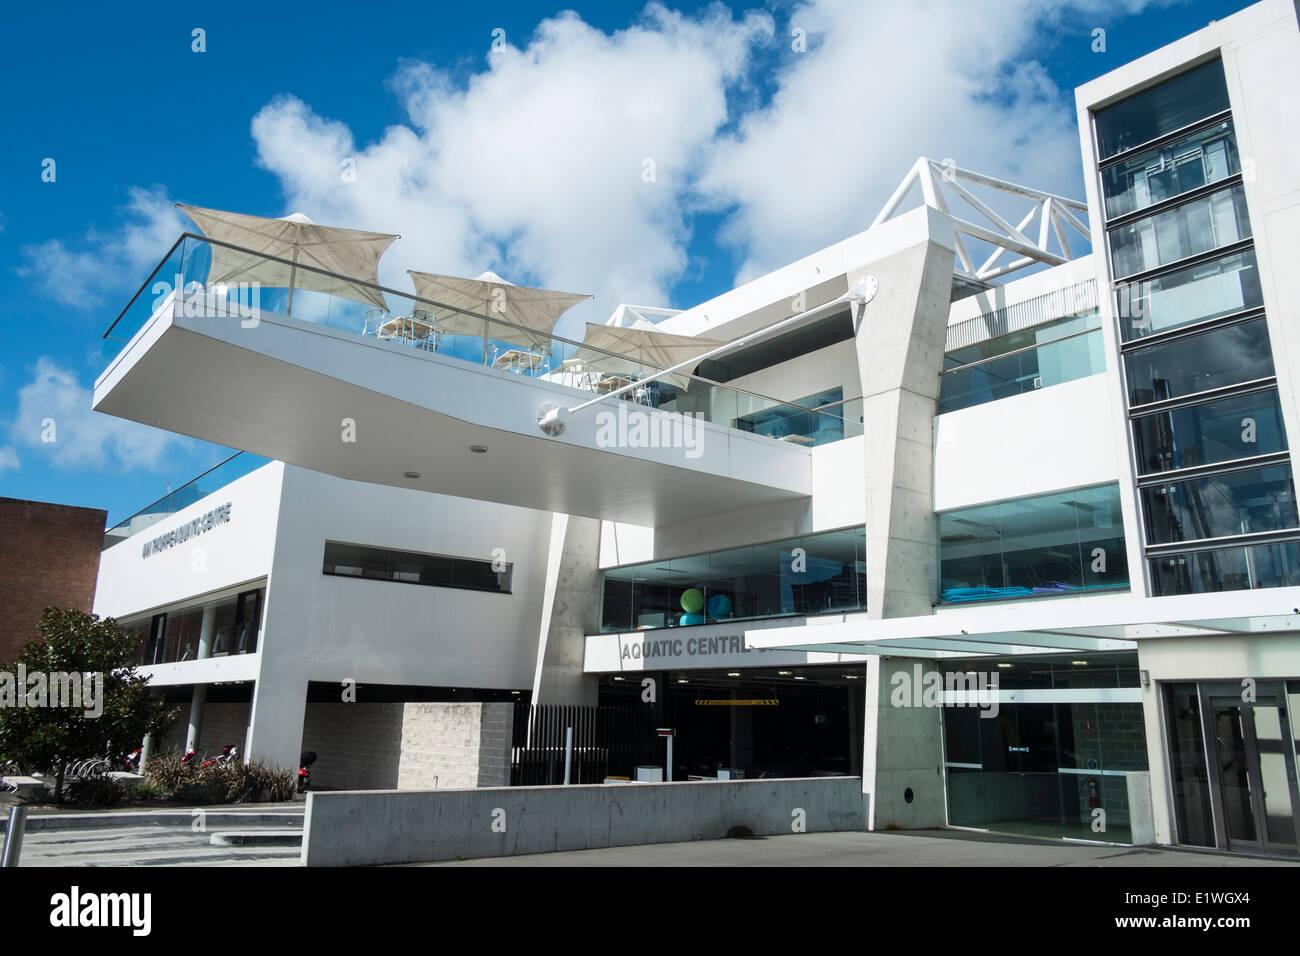 Ian Thorpe Aquatic Centre swimming pool in Sydney Australia - Stock Image